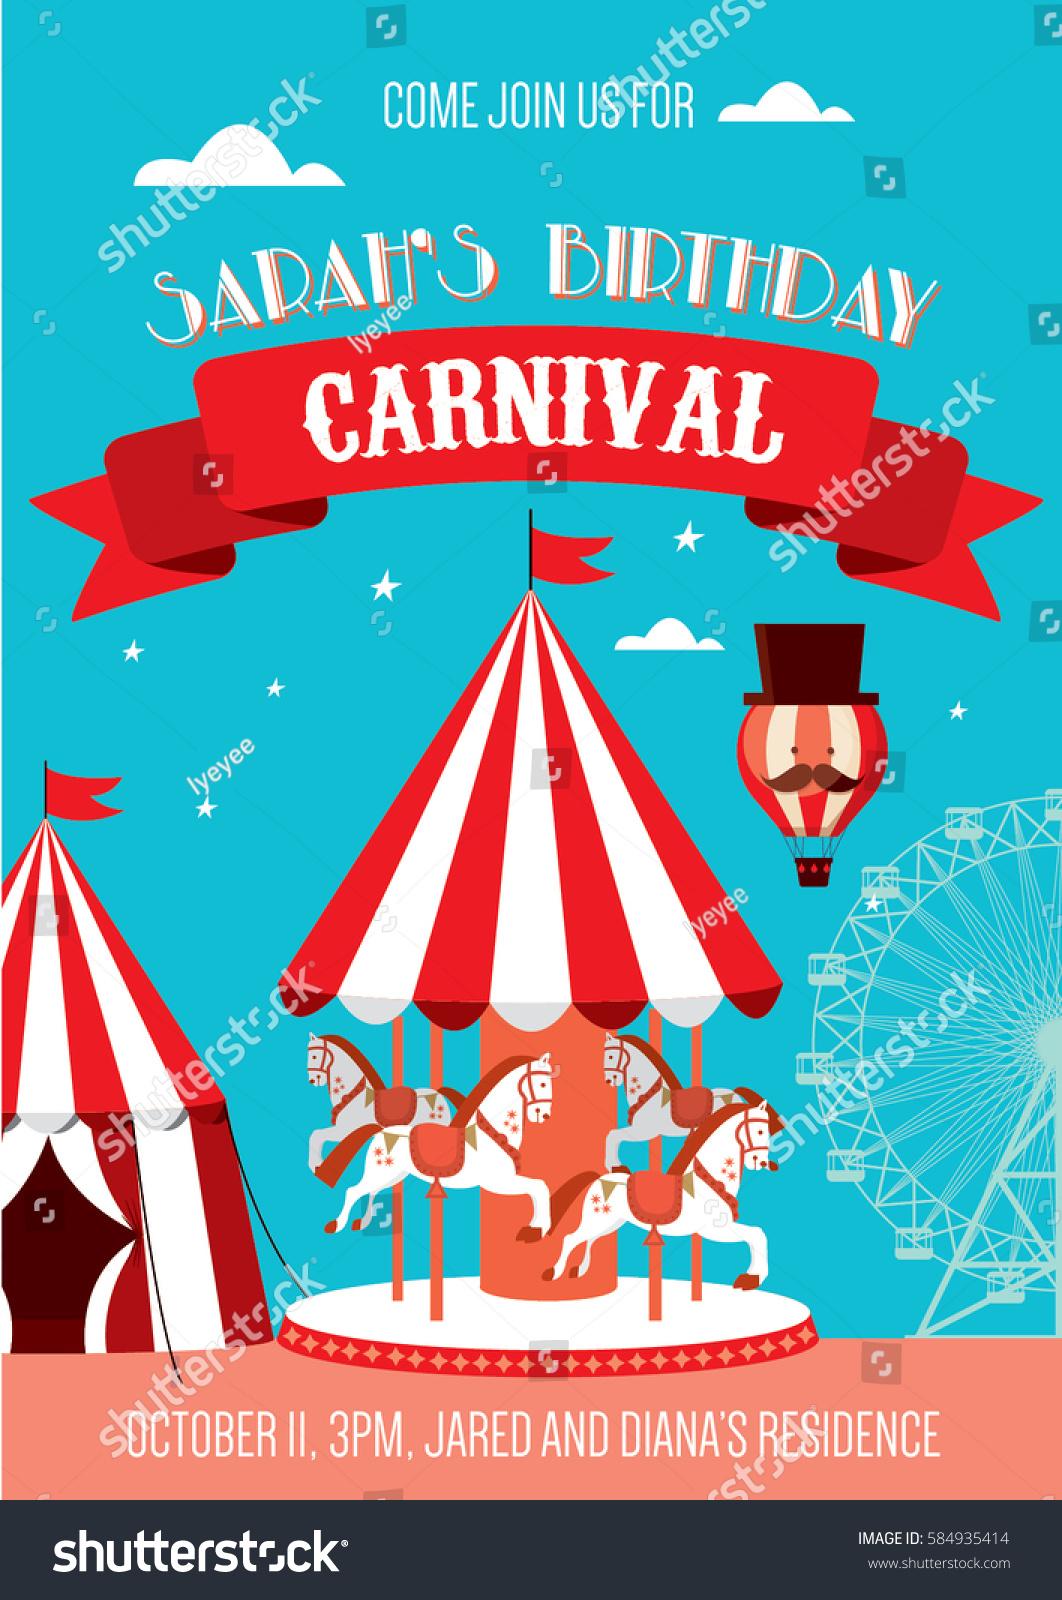 fun fair carnival birthday invitation template stock vector royalty